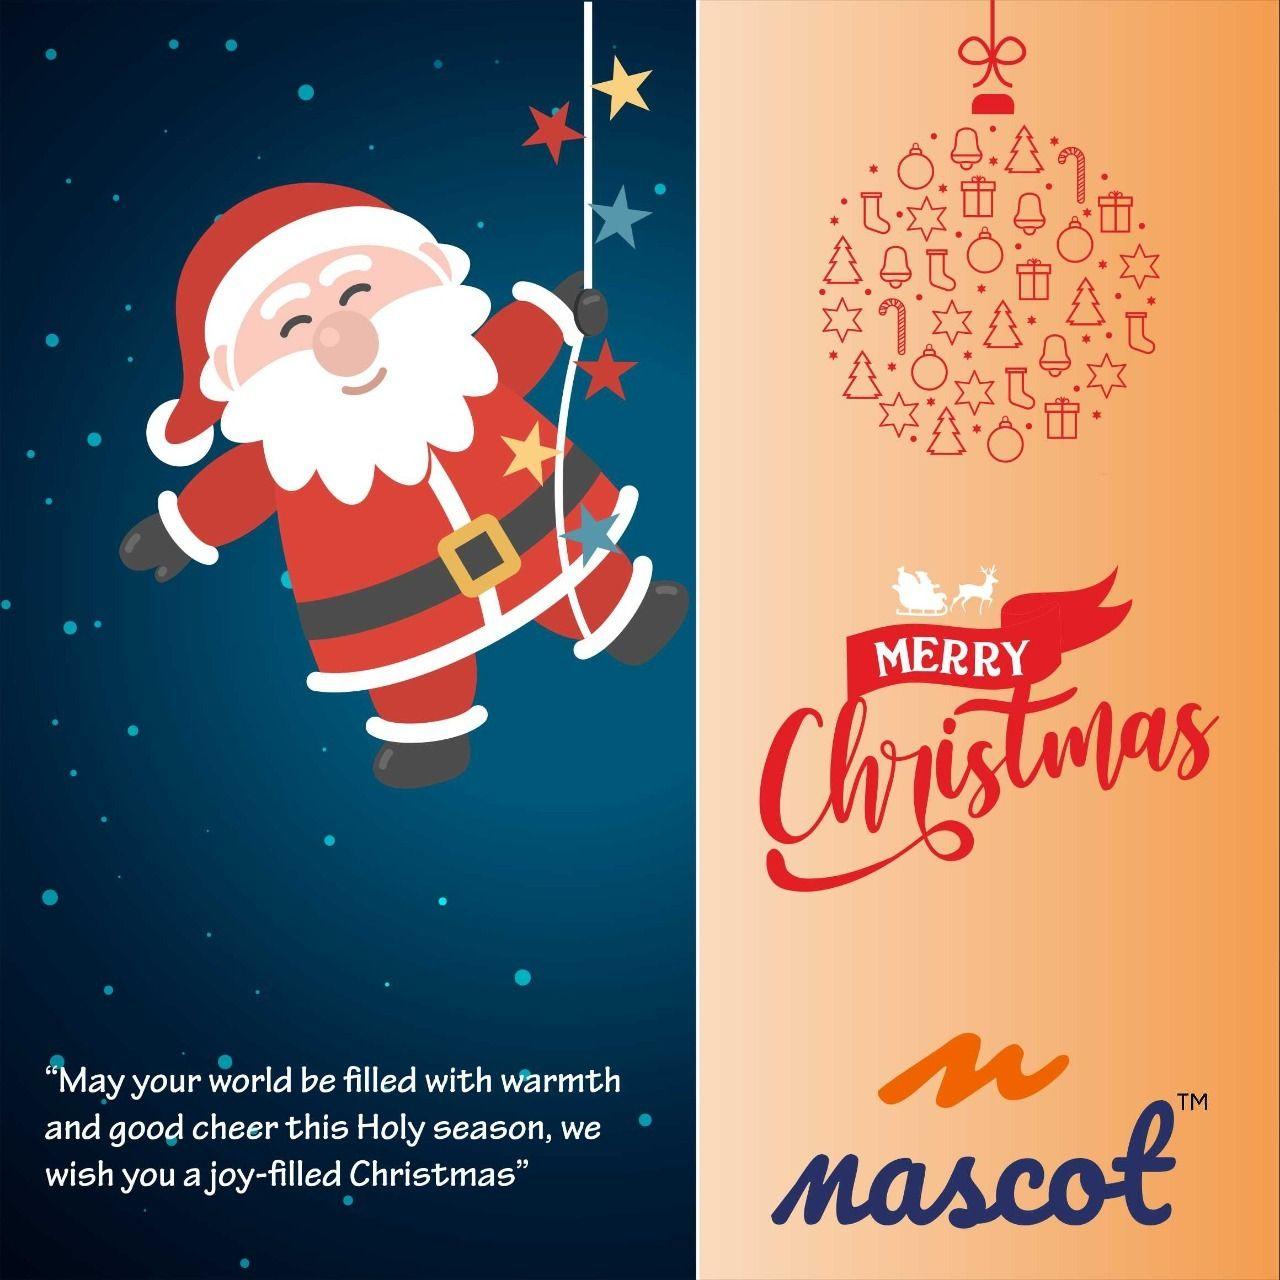 MERRY CHRISTMAS Merry, Christmas spirit, Good cheer